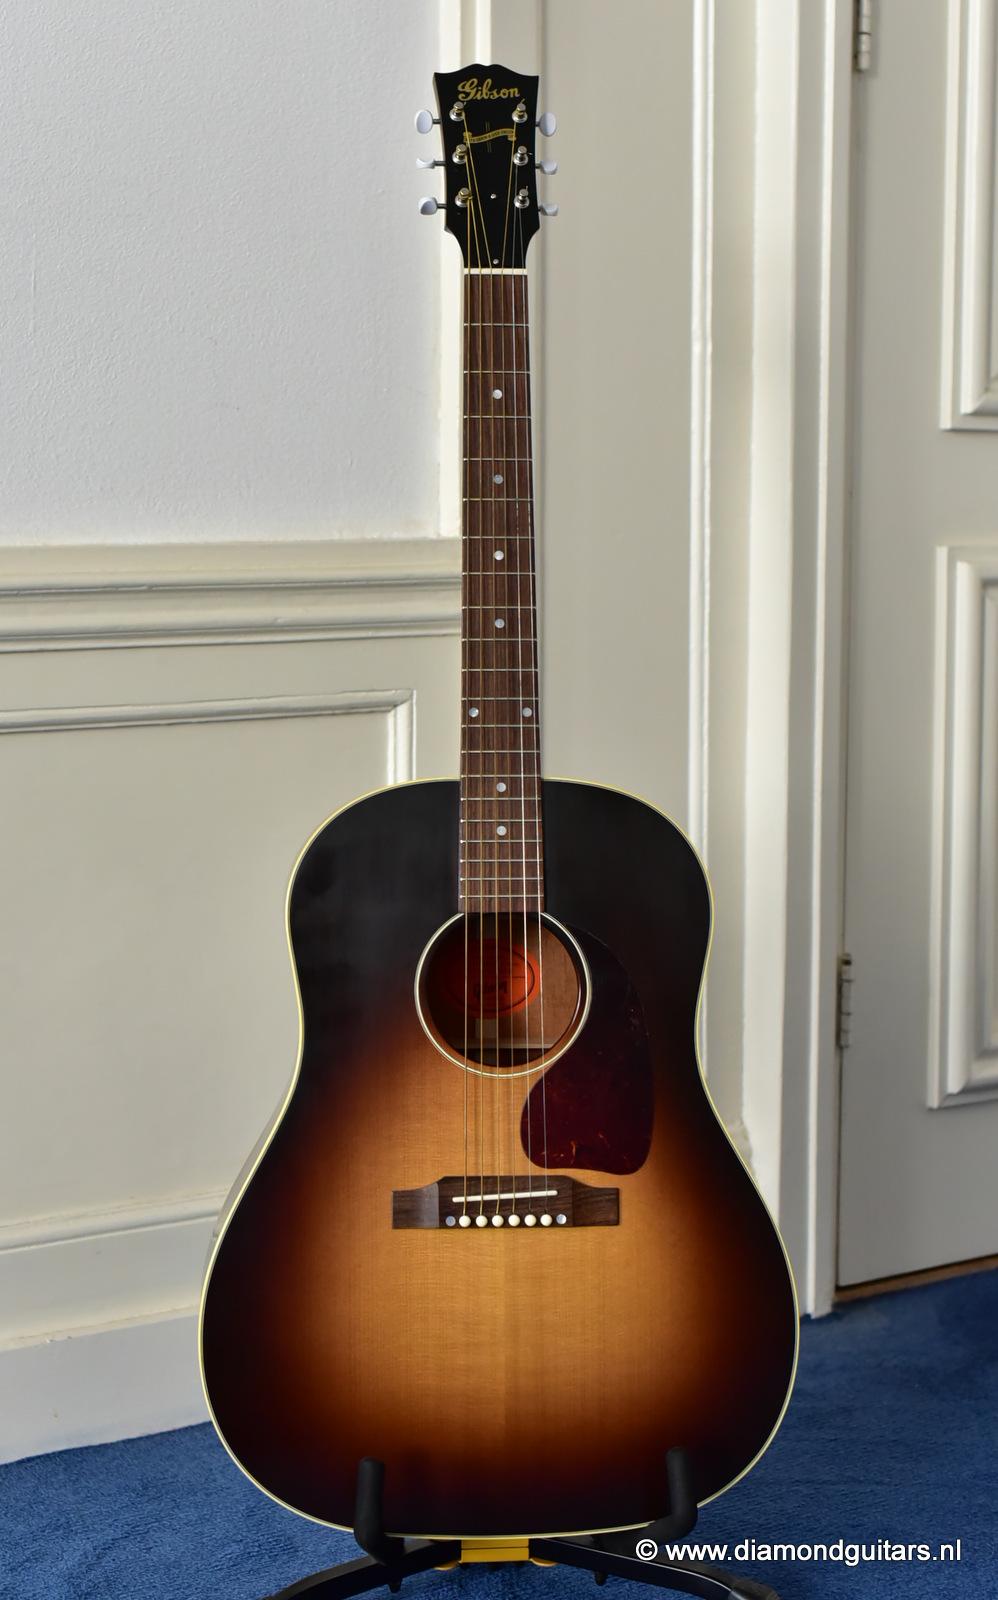 gibson j 45 true vintage sold diamond guitars. Black Bedroom Furniture Sets. Home Design Ideas